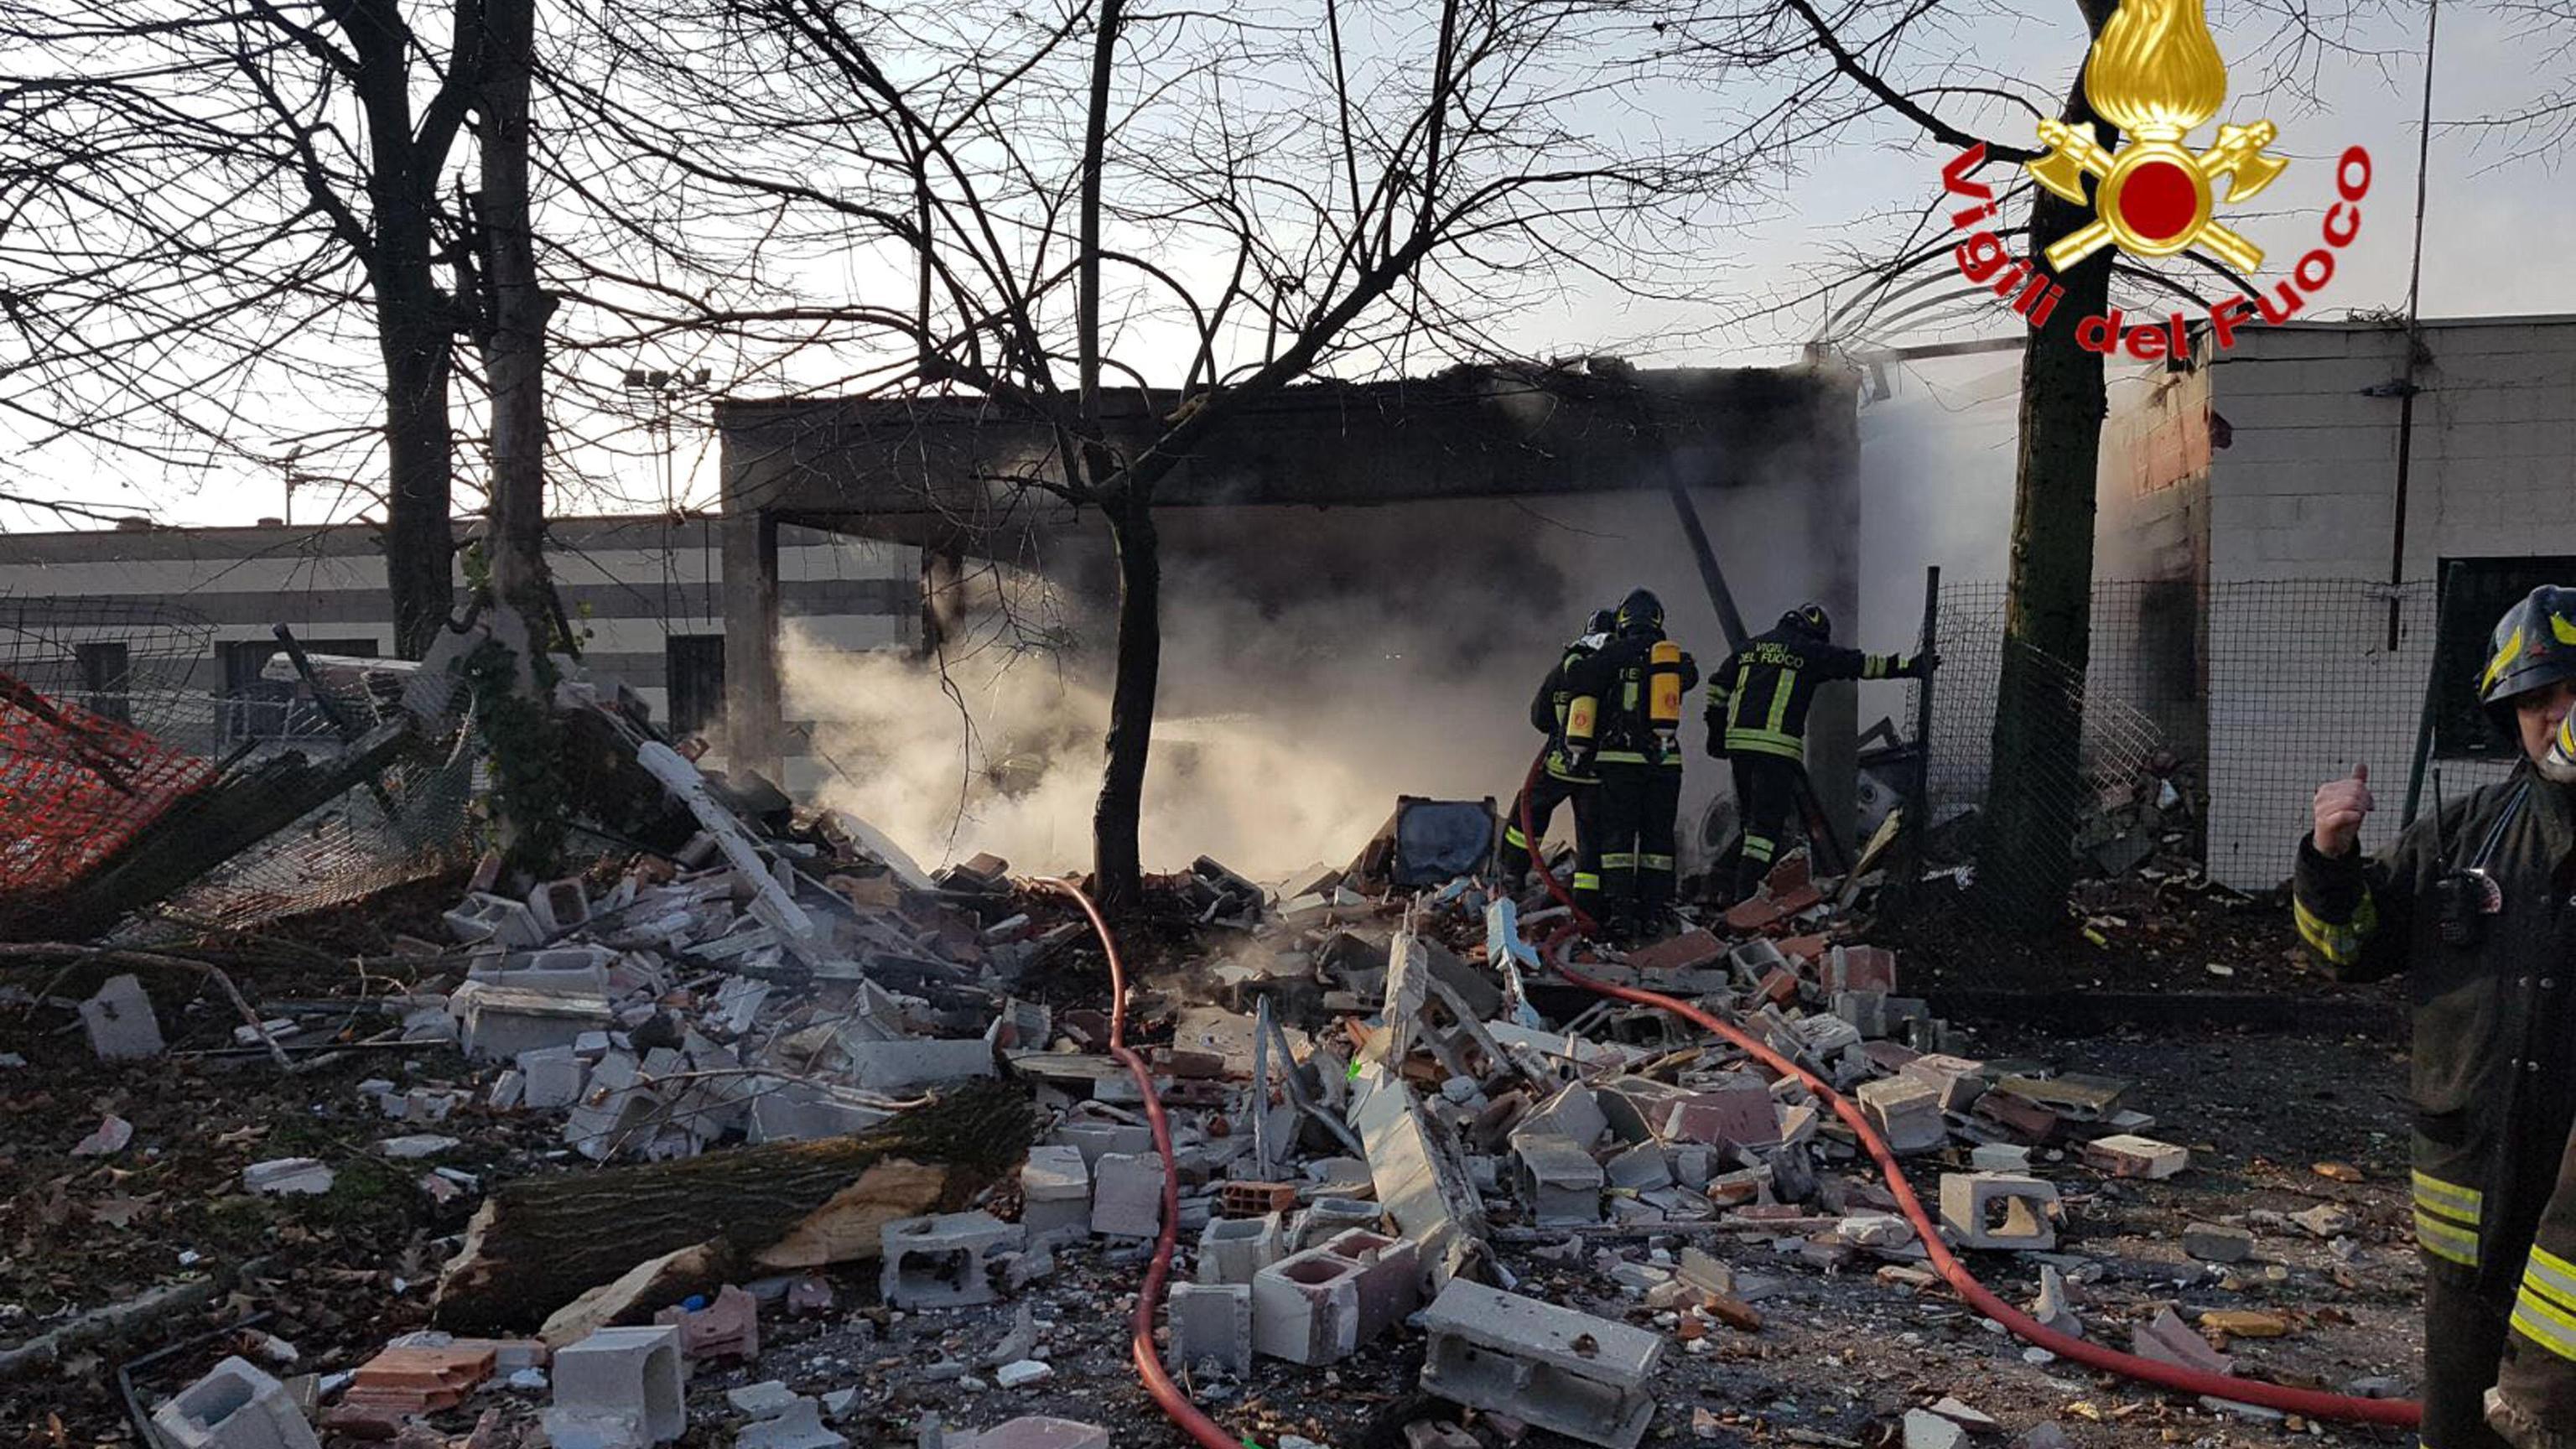 Esplosione in kartodromo, due ustionati